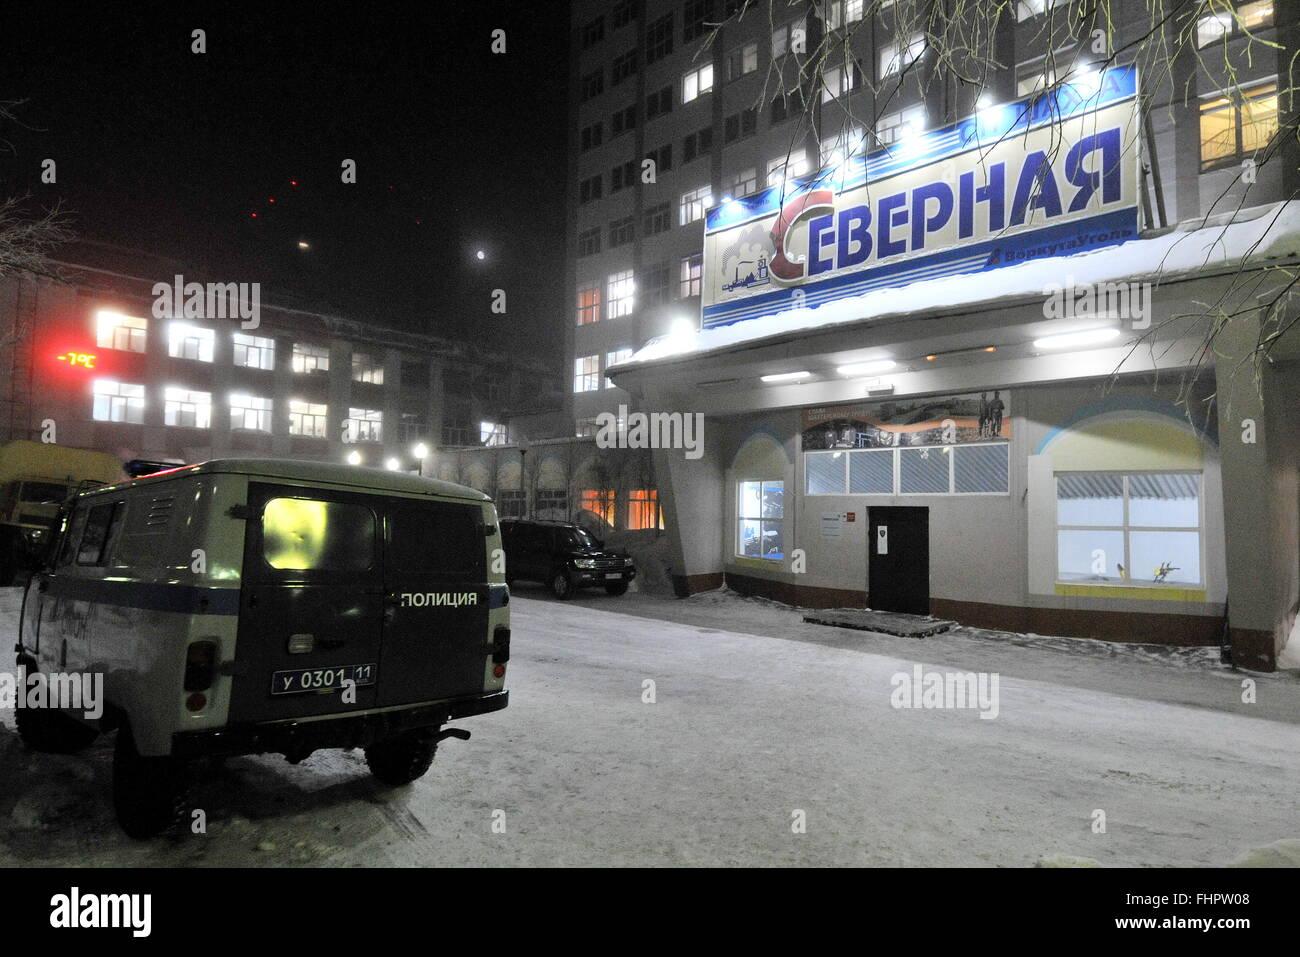 Vorkuta, Russia. 25th Feb, 2016. The Severnaya coal mine of the Vorkutaugol coal producer where a rock burst occurred. Stock Photo